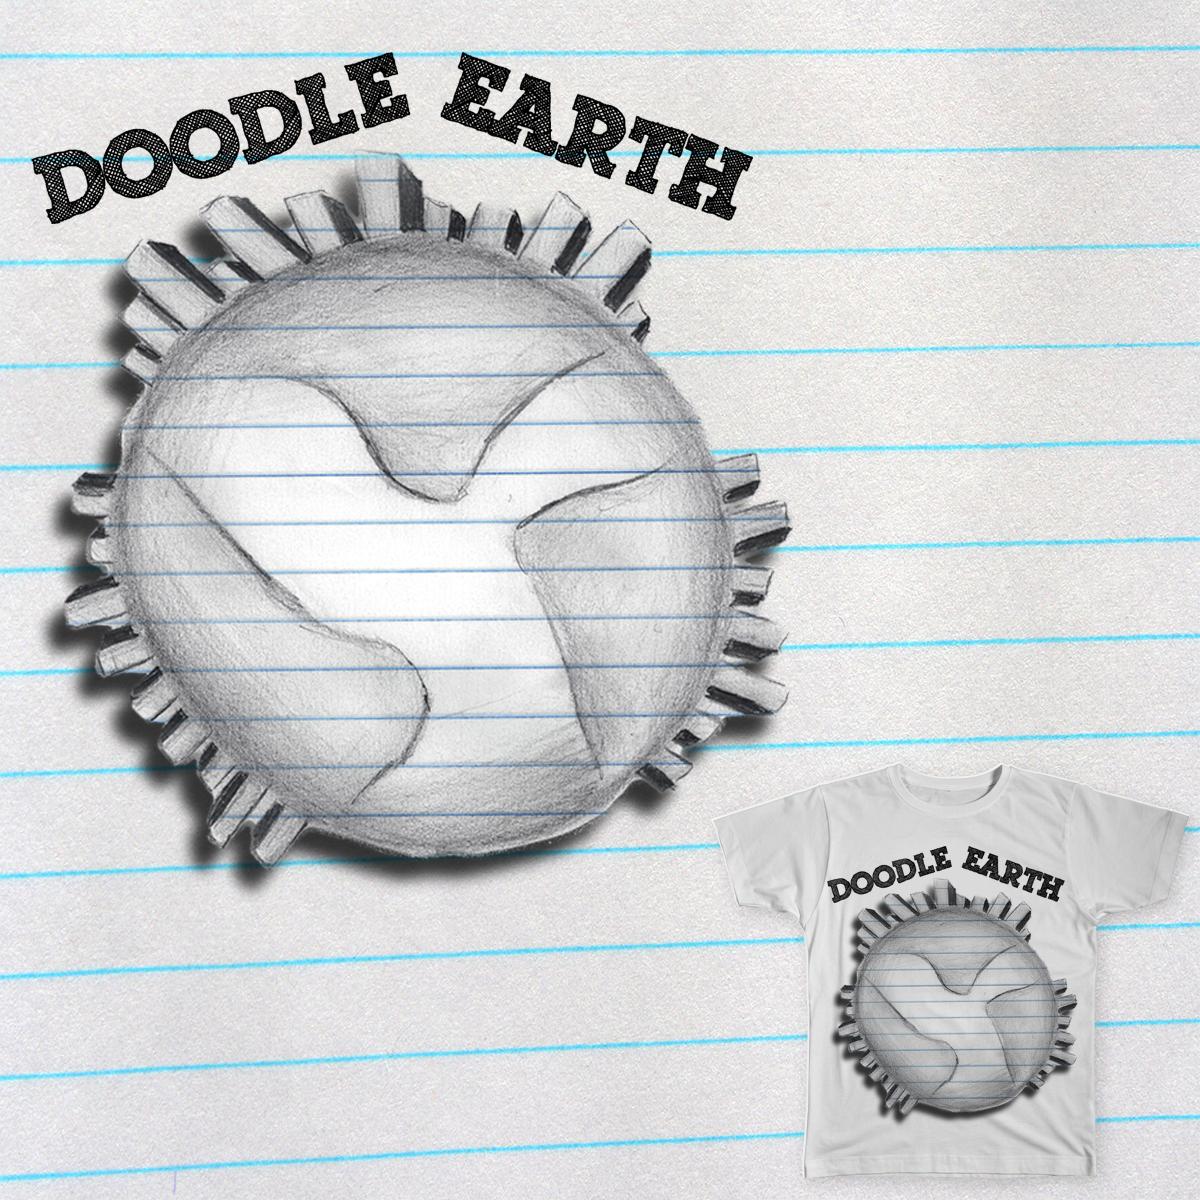 Doodle Earth by LittleDesignerStudios on Threadless